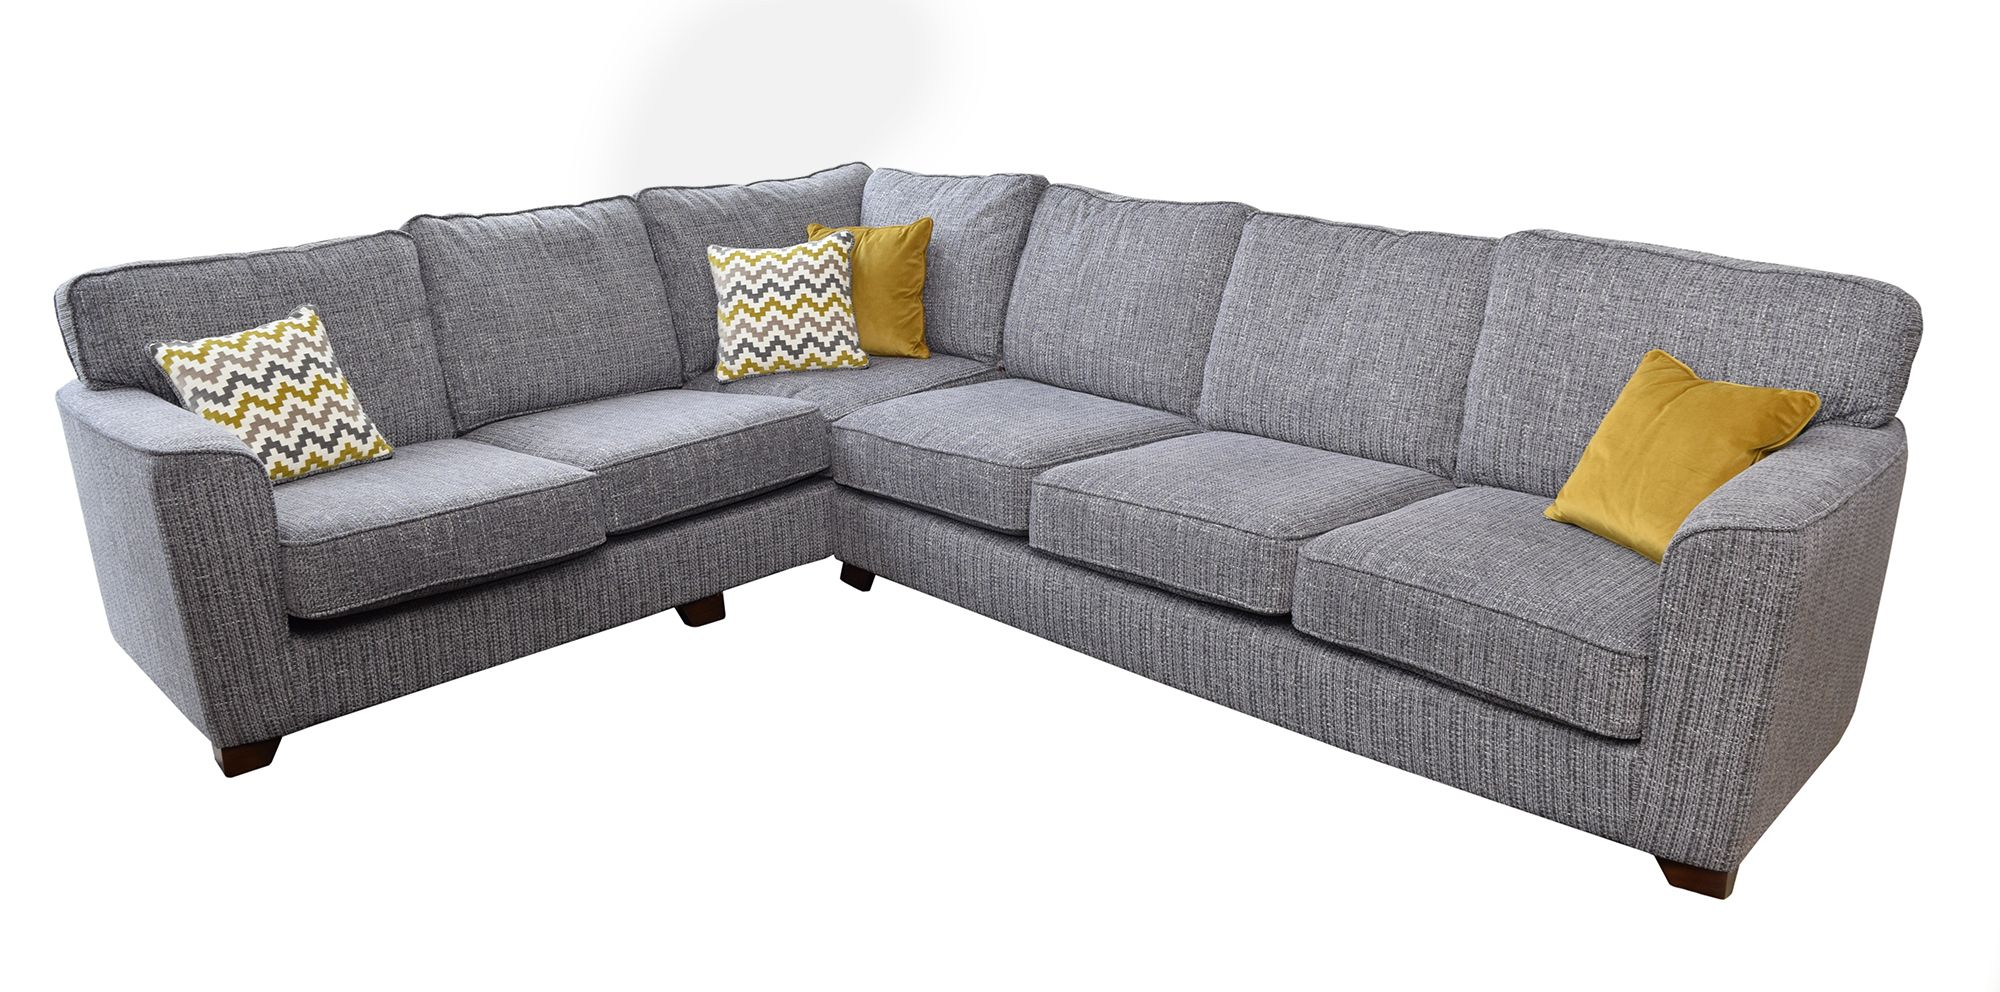 promo code 48fdc 4d63a Bali 4 Seater + 2 Seater Corner Sofa LHF Fabric B